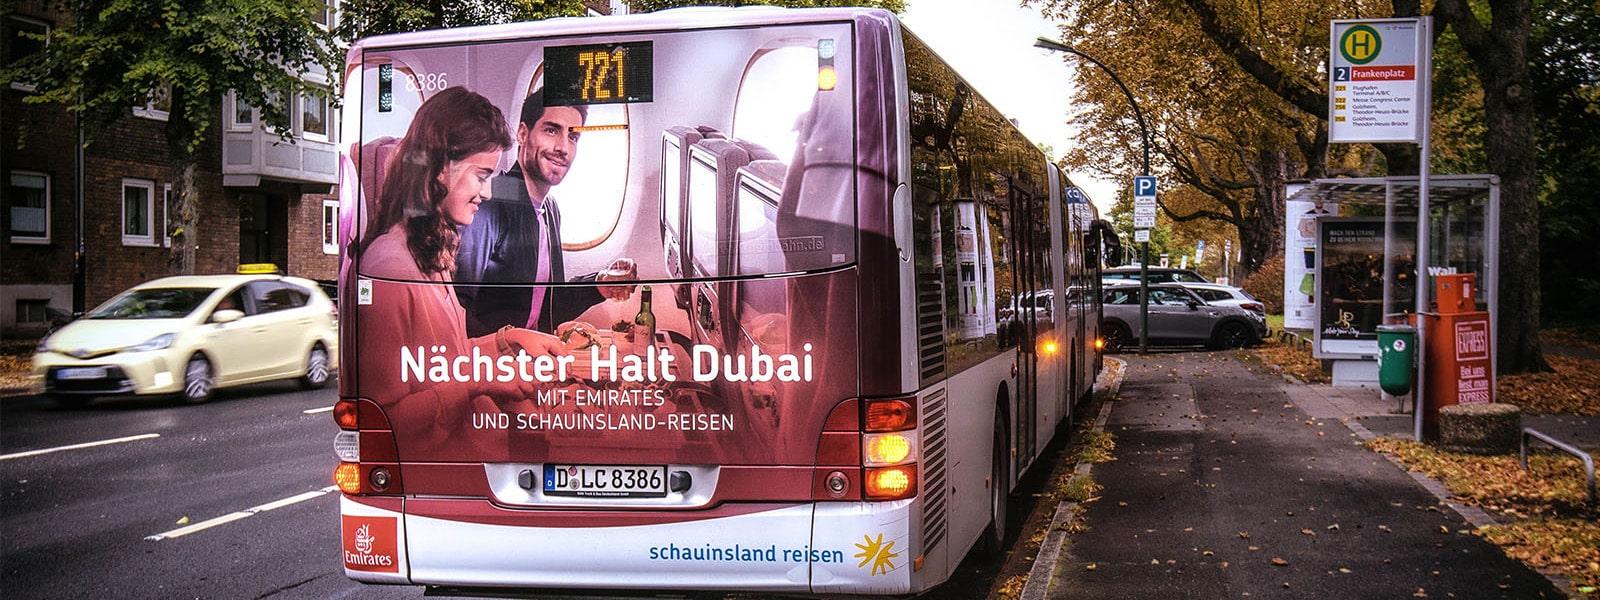 Duesseldorf-Verkehrsmittelwerbung-Bus-Heckflaechenwerbung